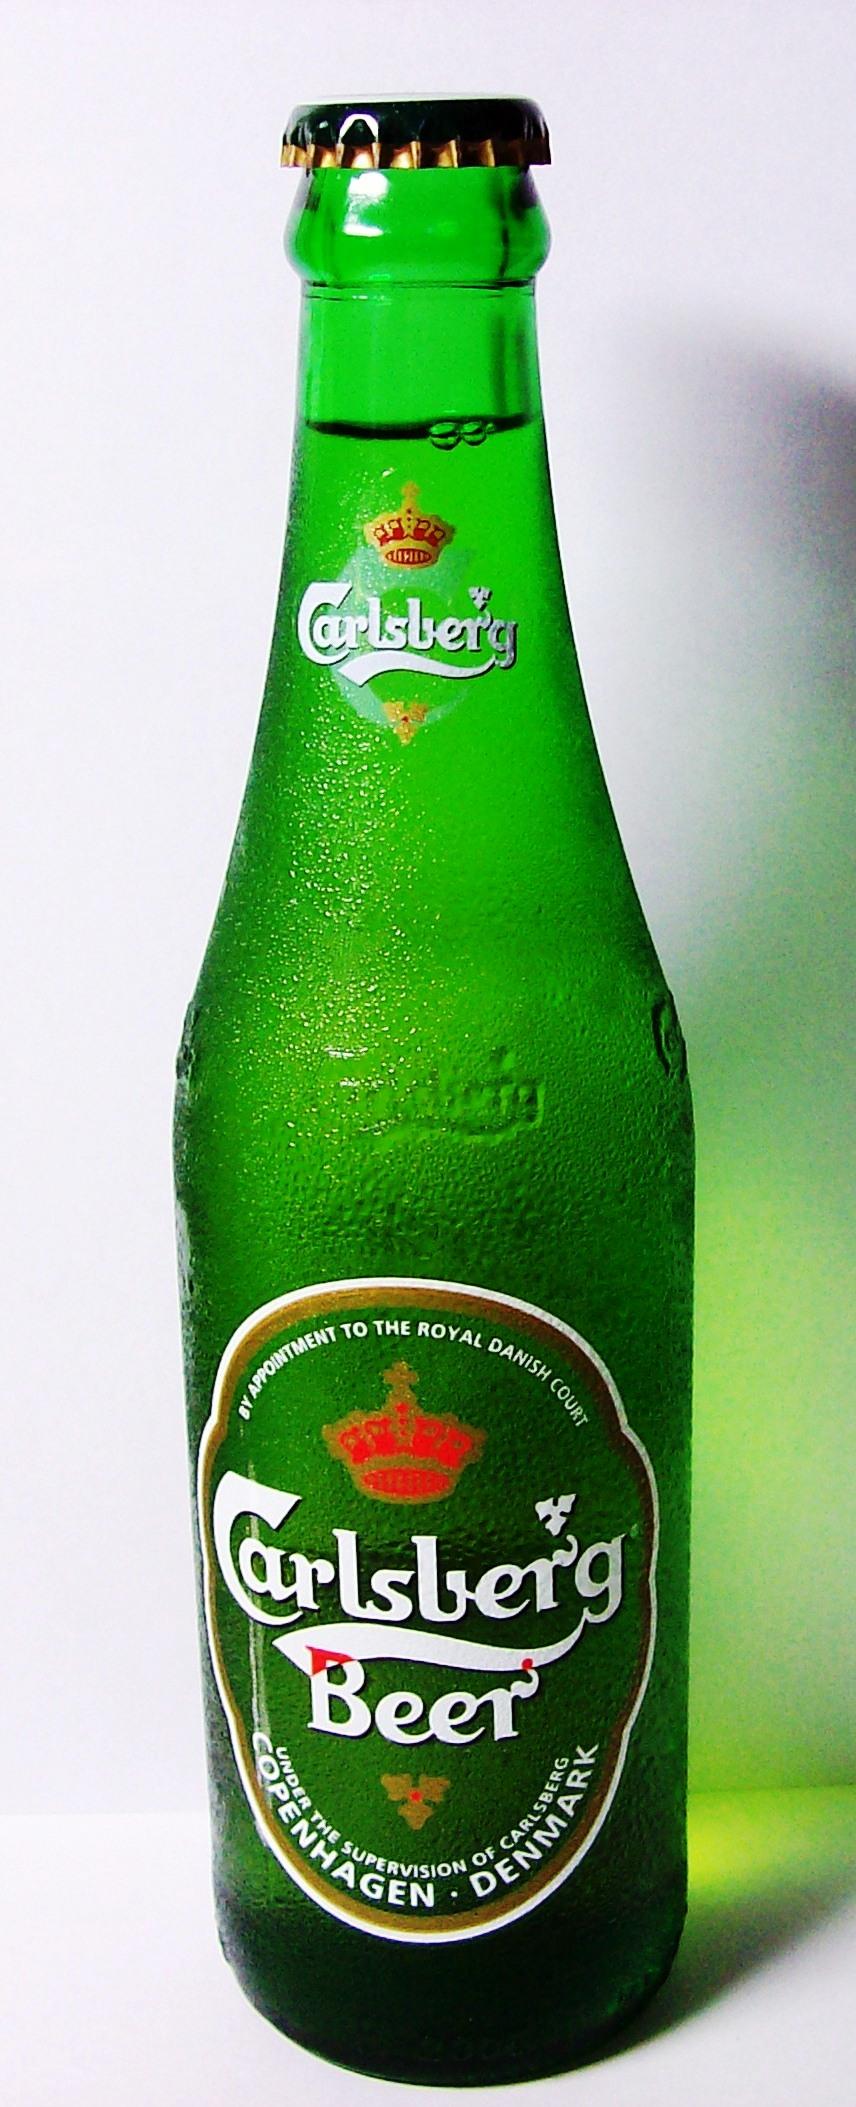 http://chronicle.com/img/photos/biz/Carlsberg_beer.jpg